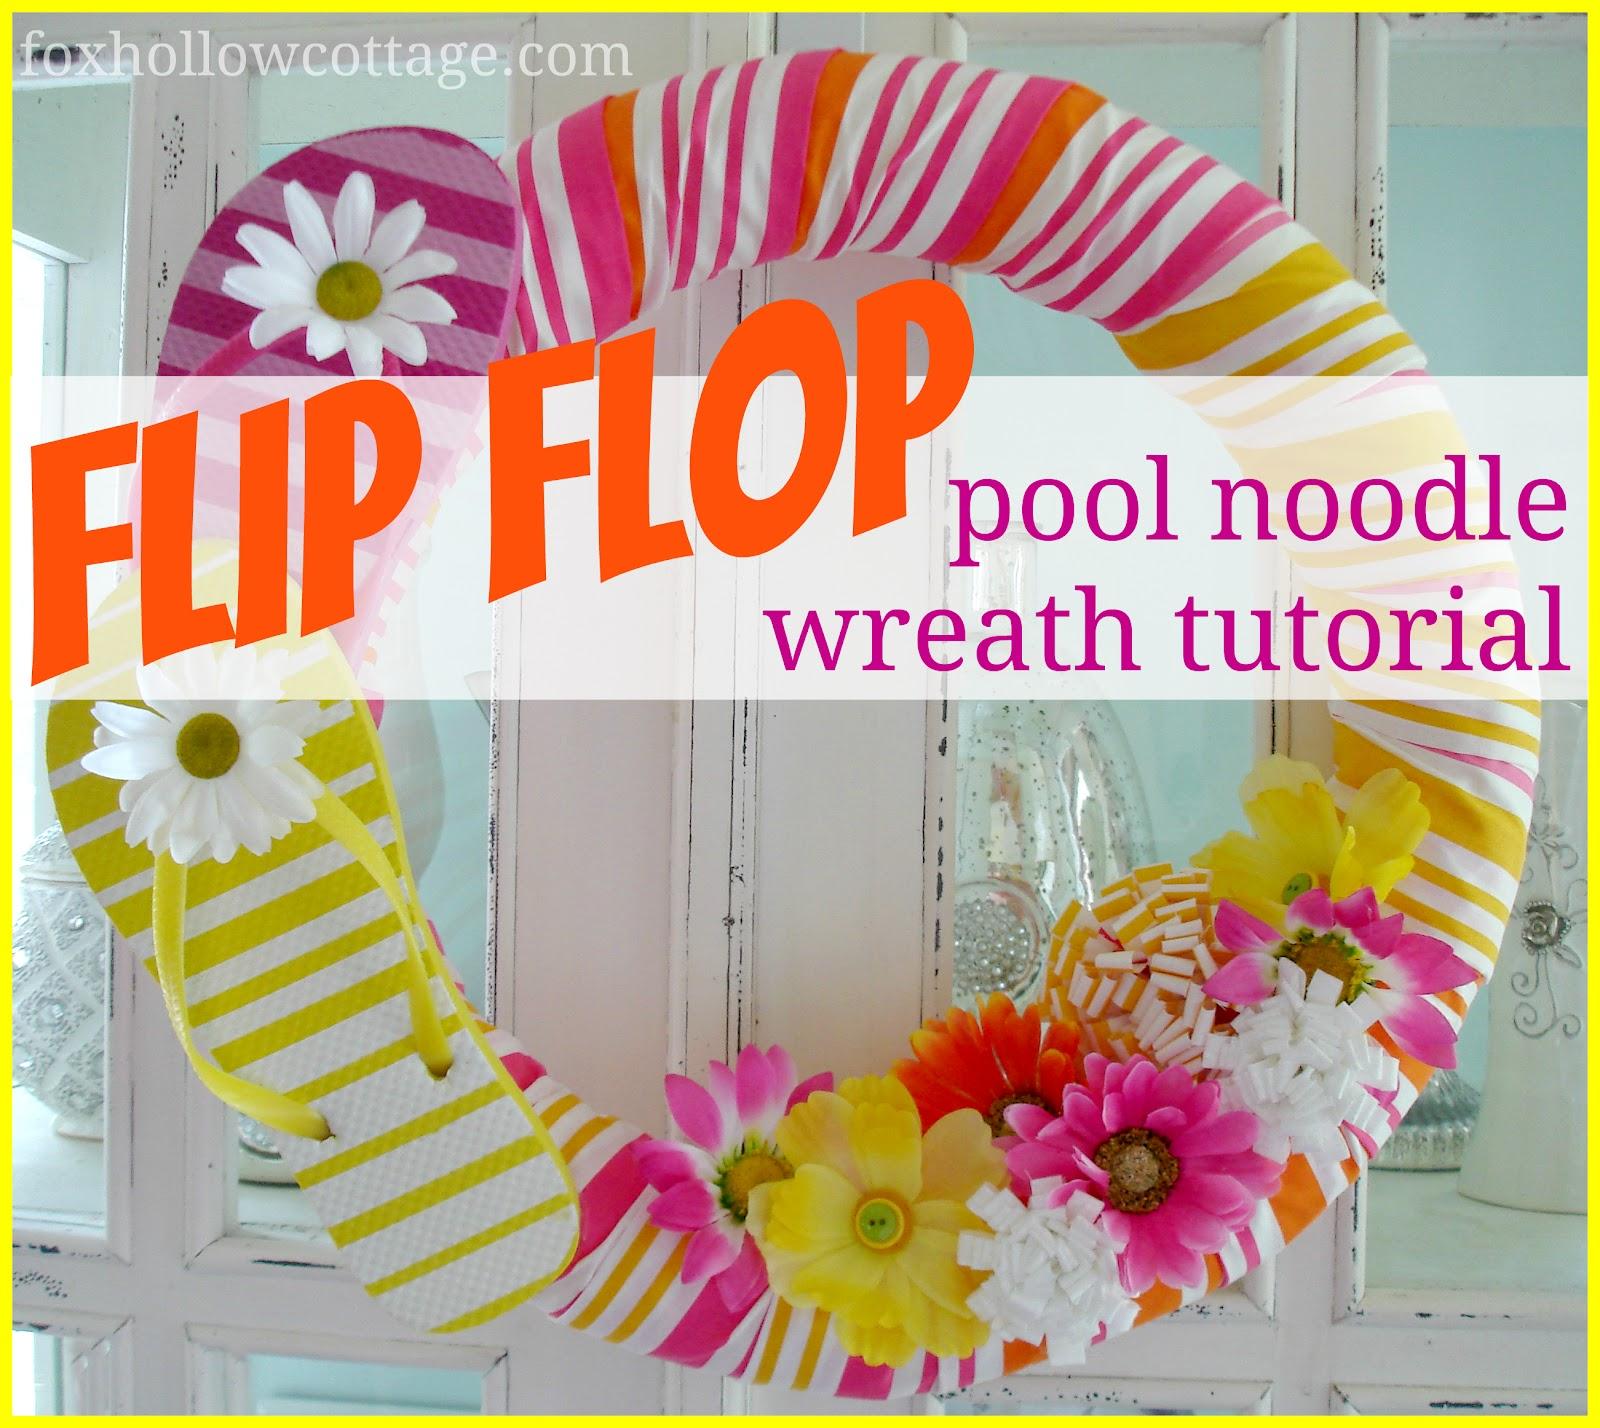 Flip Flop Summer Pool Noodle Wreath Tutorial Fox Hollow Cottage